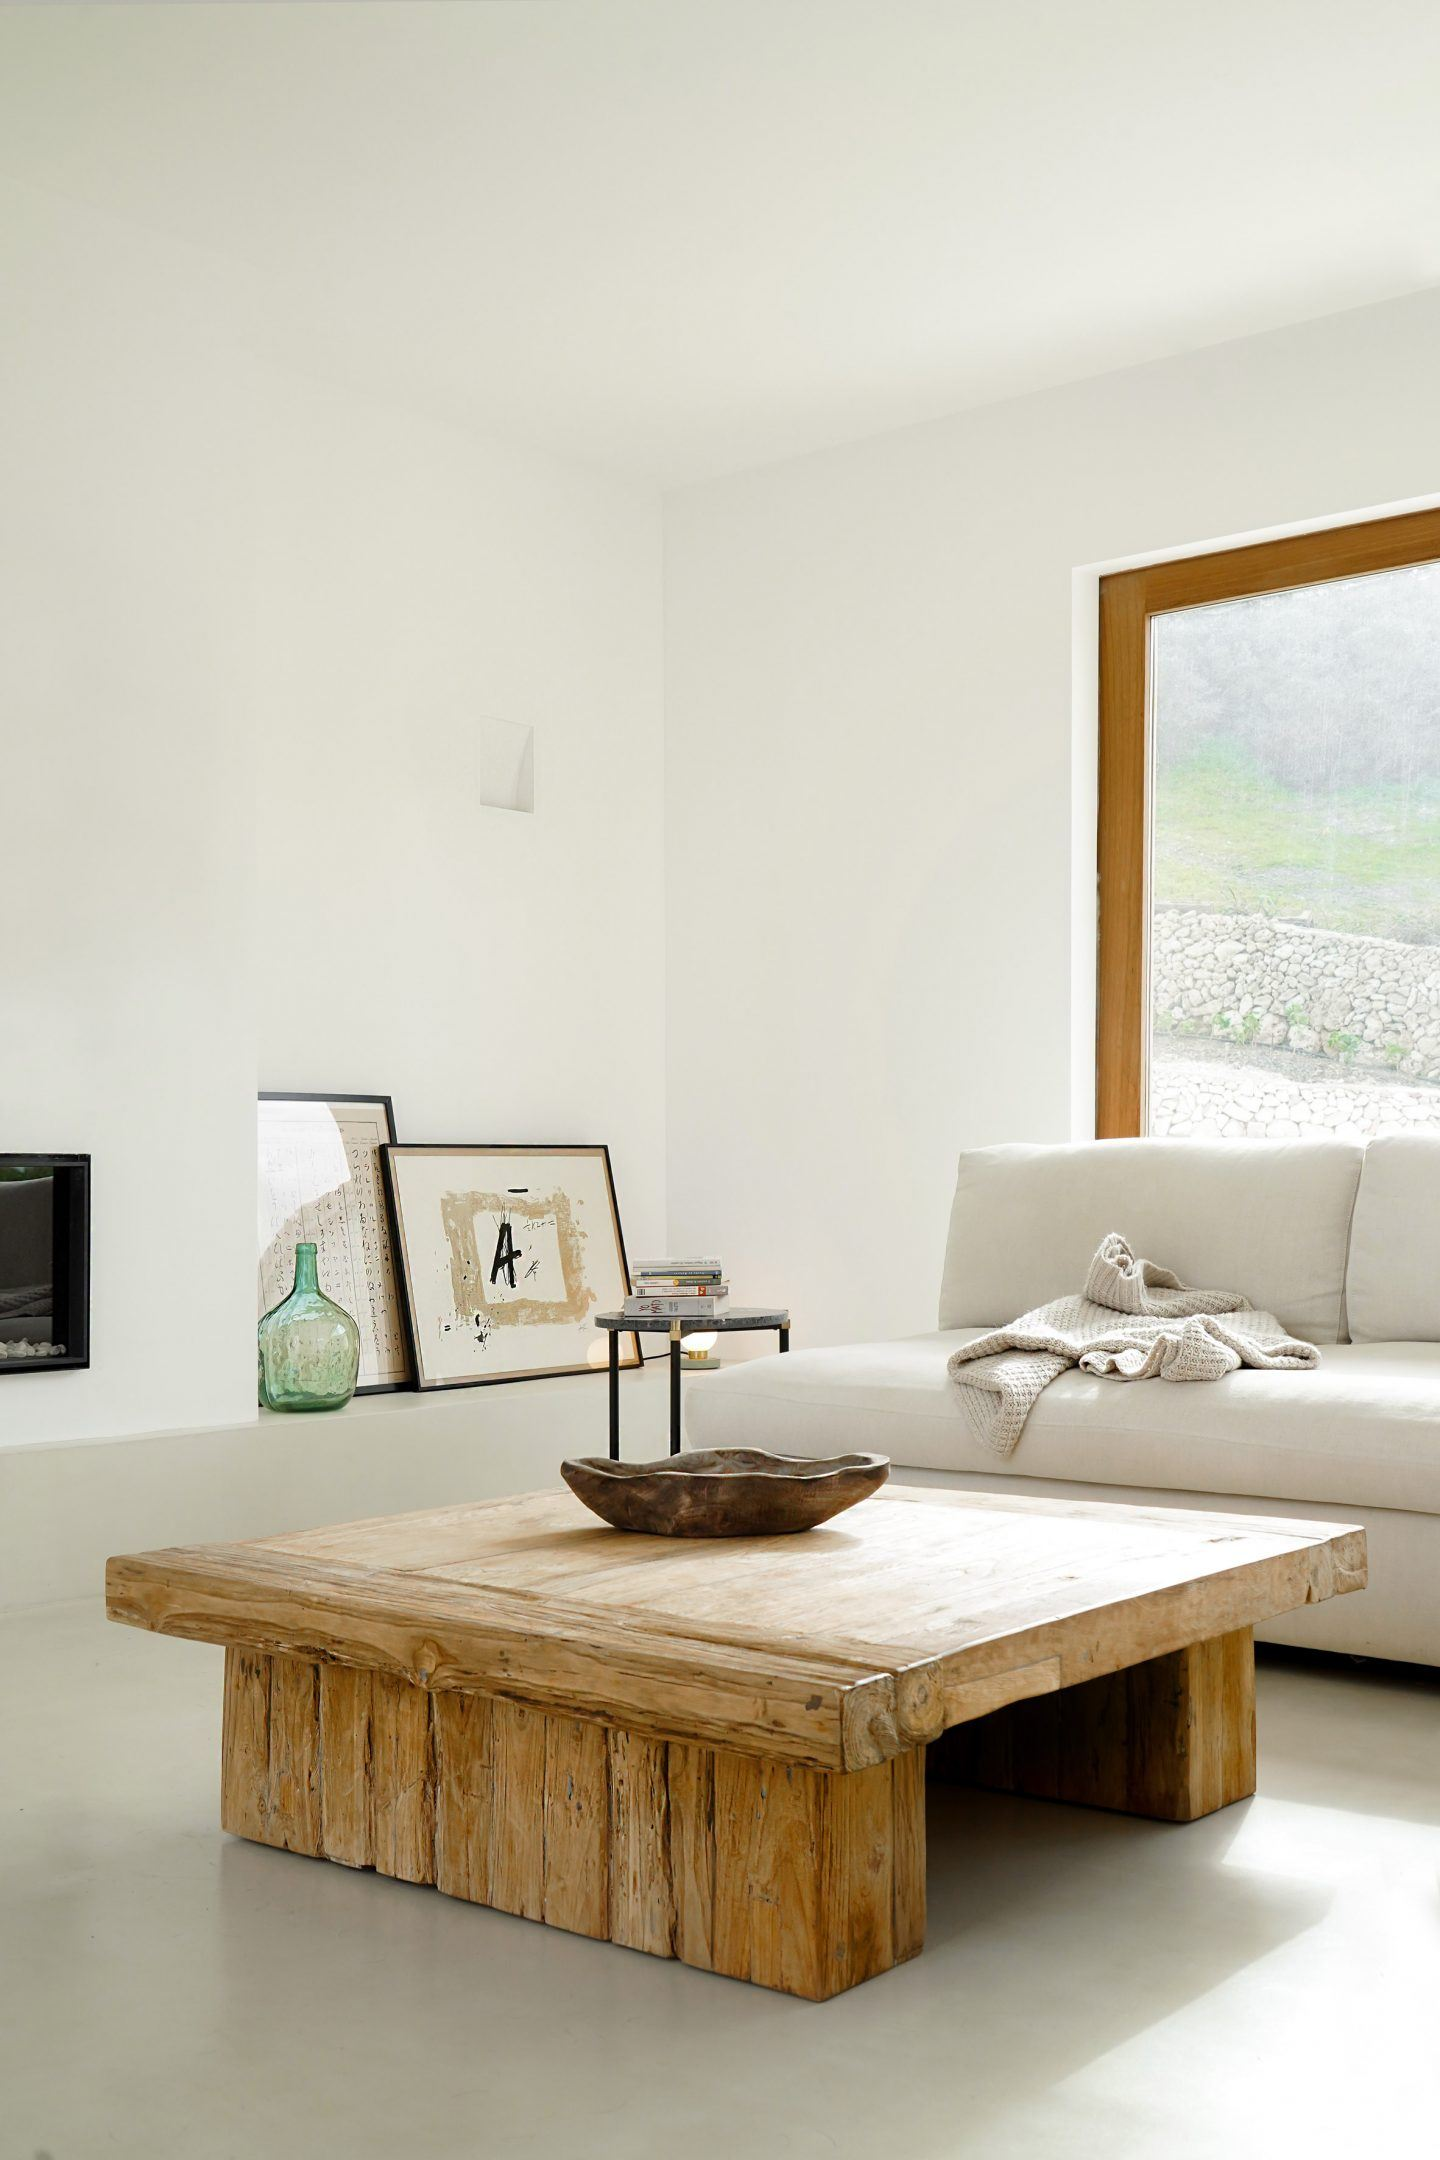 IGNANT-Architecture-Marina-Senabre-Menorca-House-07